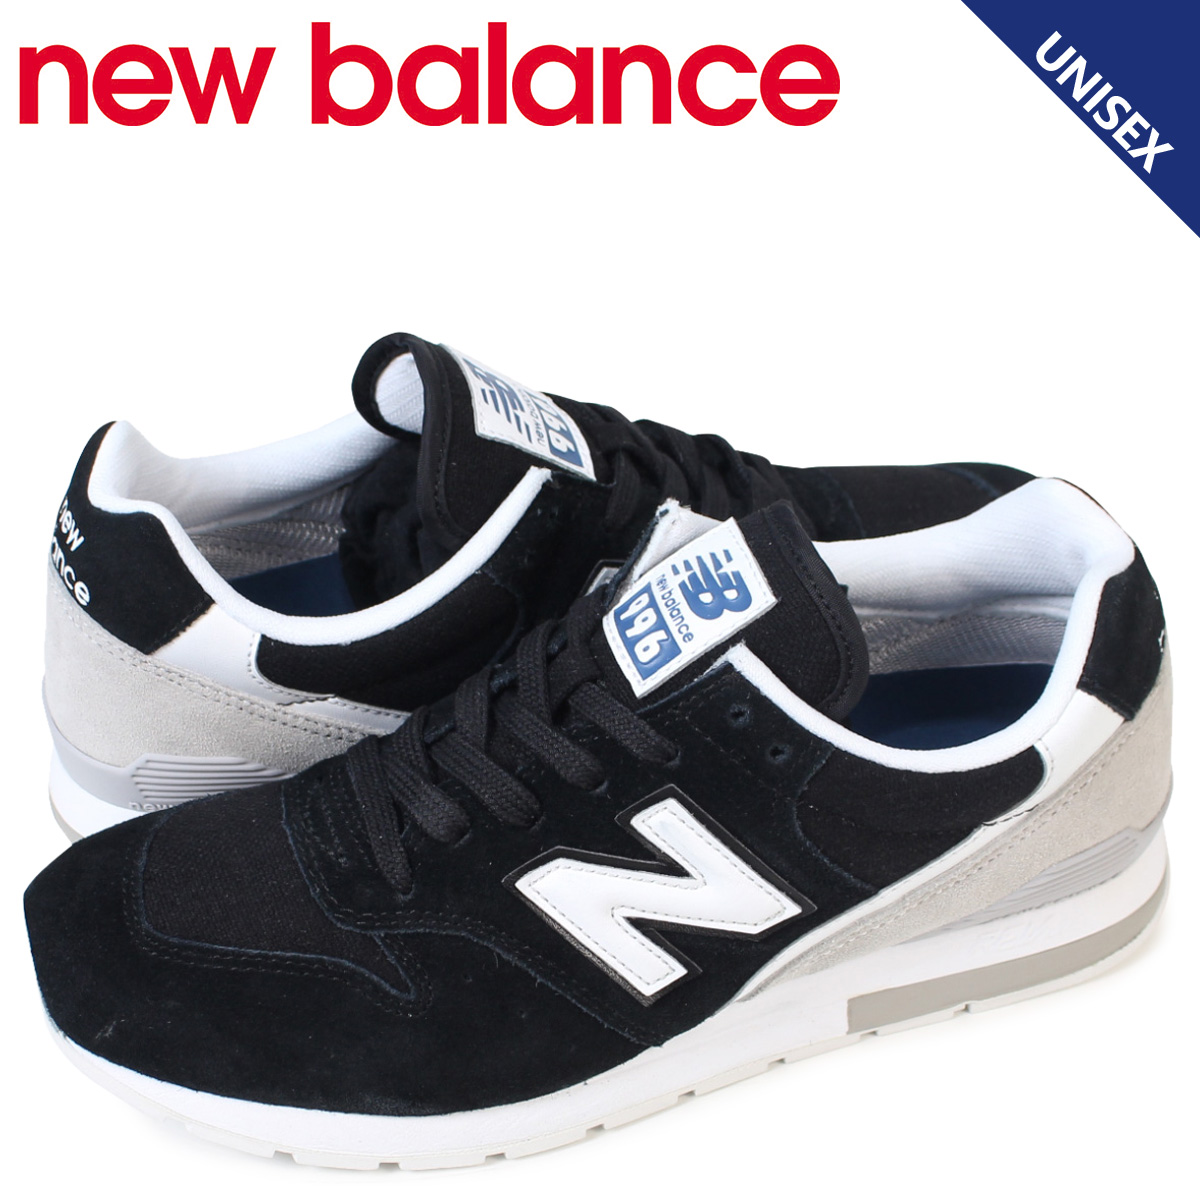 new balance mrl996jv